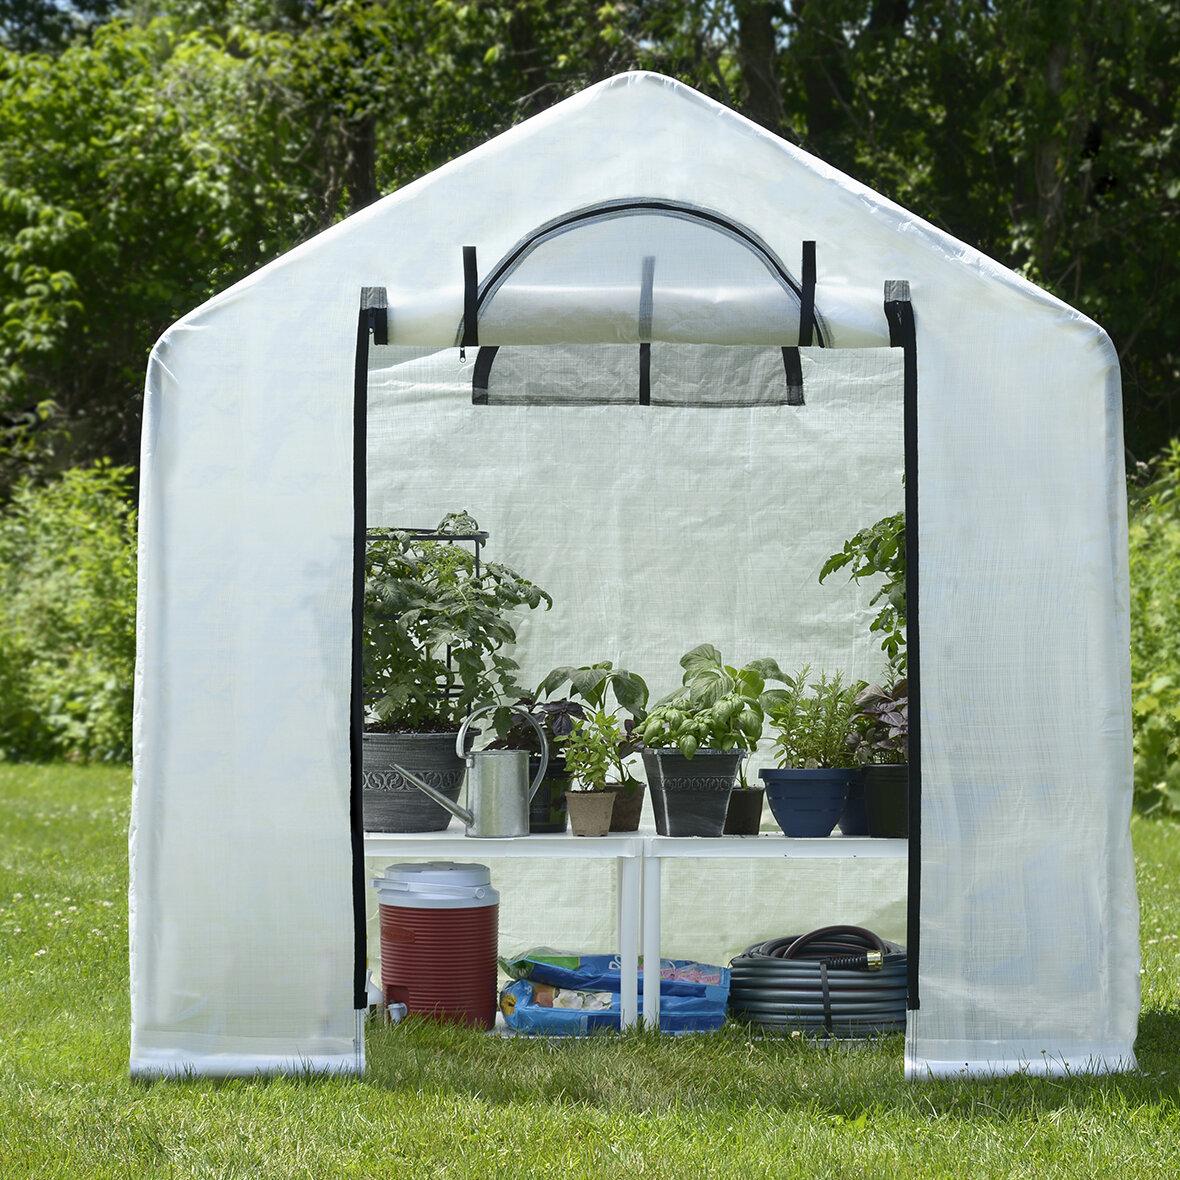 Shelterlogic Growit Backyard 6 Ft W X 4 Ft D Mini Greenhouse Reviews Wayfair Growit backyard greenhouse reviews